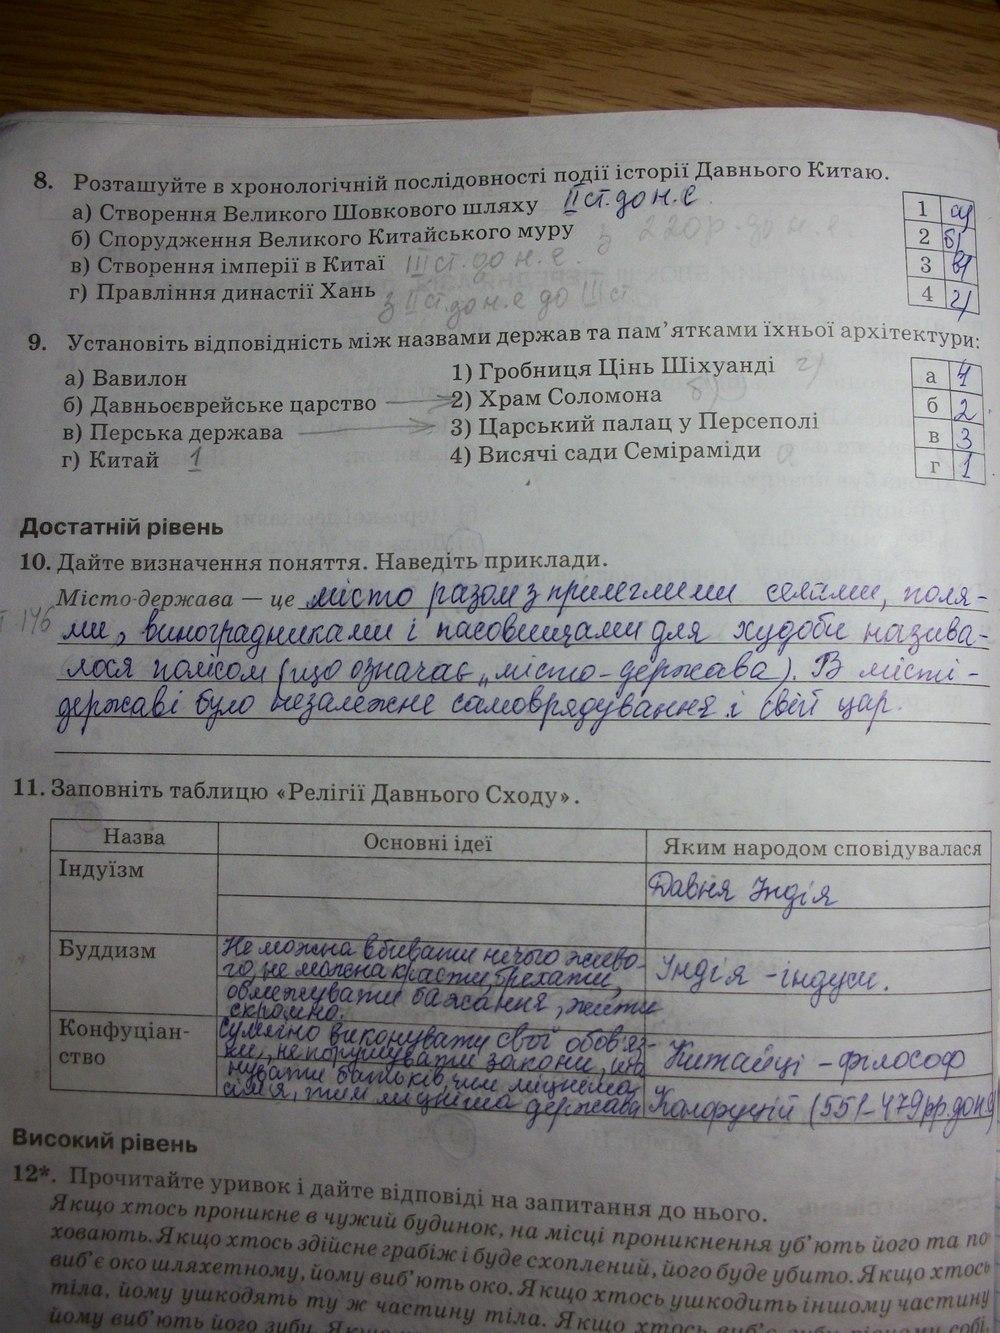 ГДЗ рабочие тетради 6 класс. Задание: стр. 20